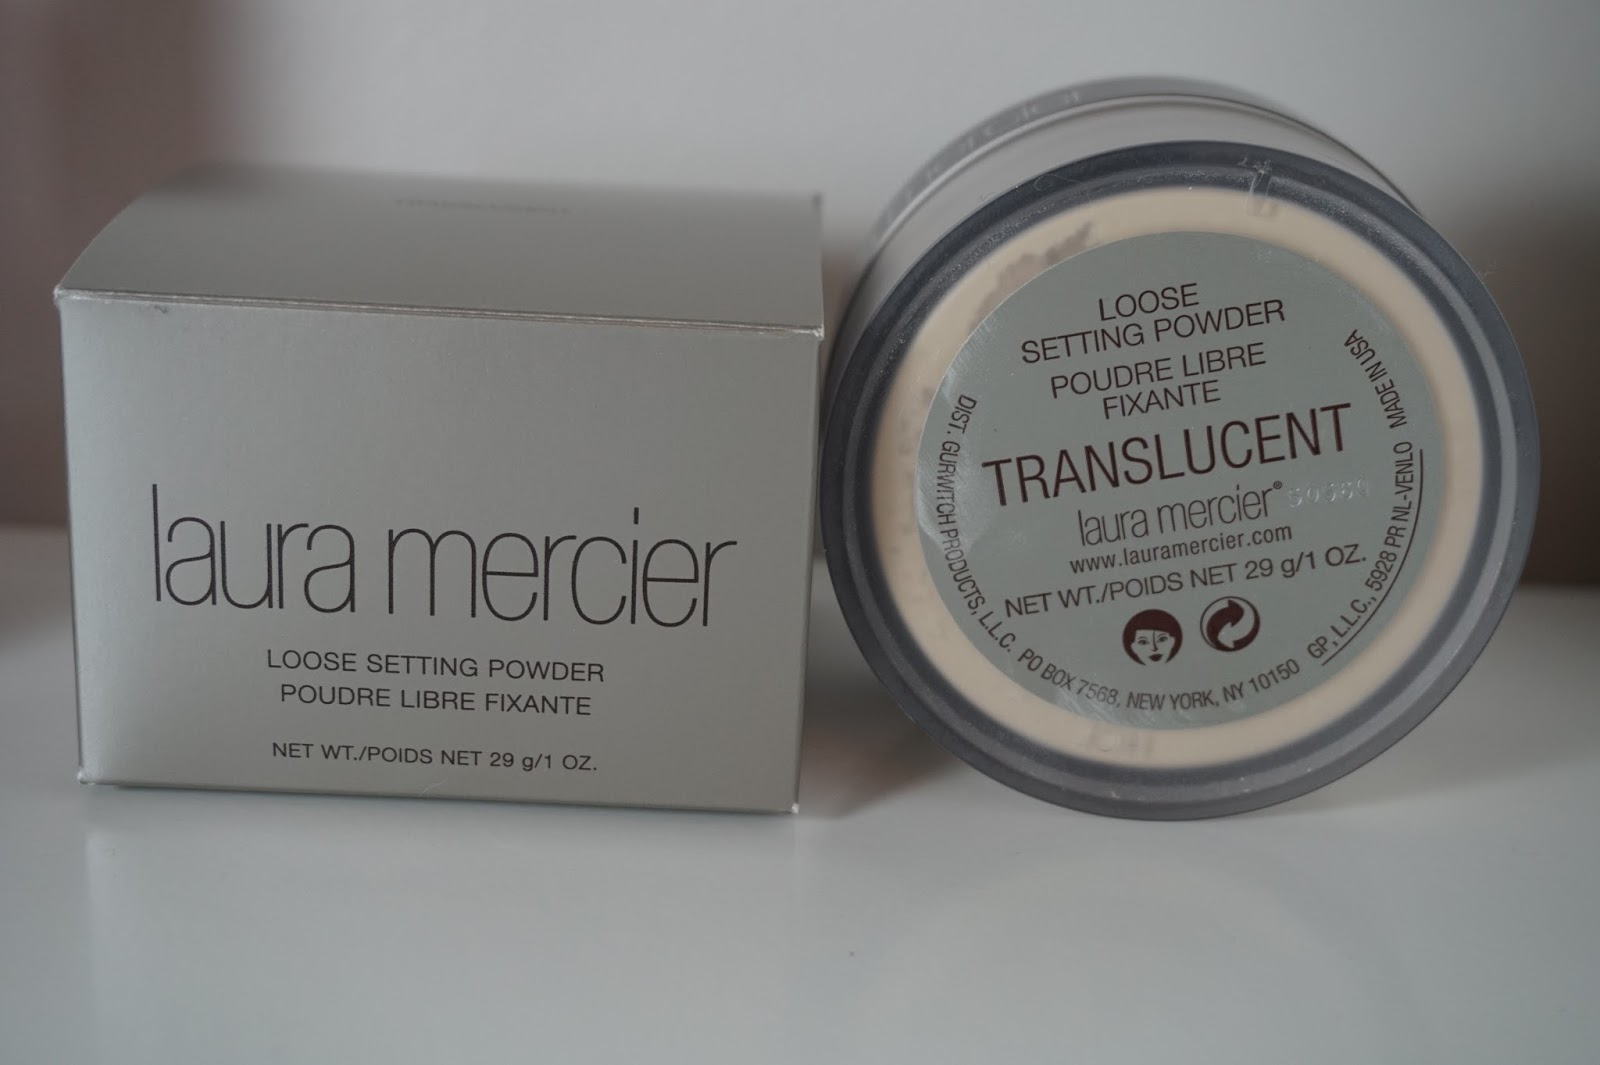 how to put translucent powder on